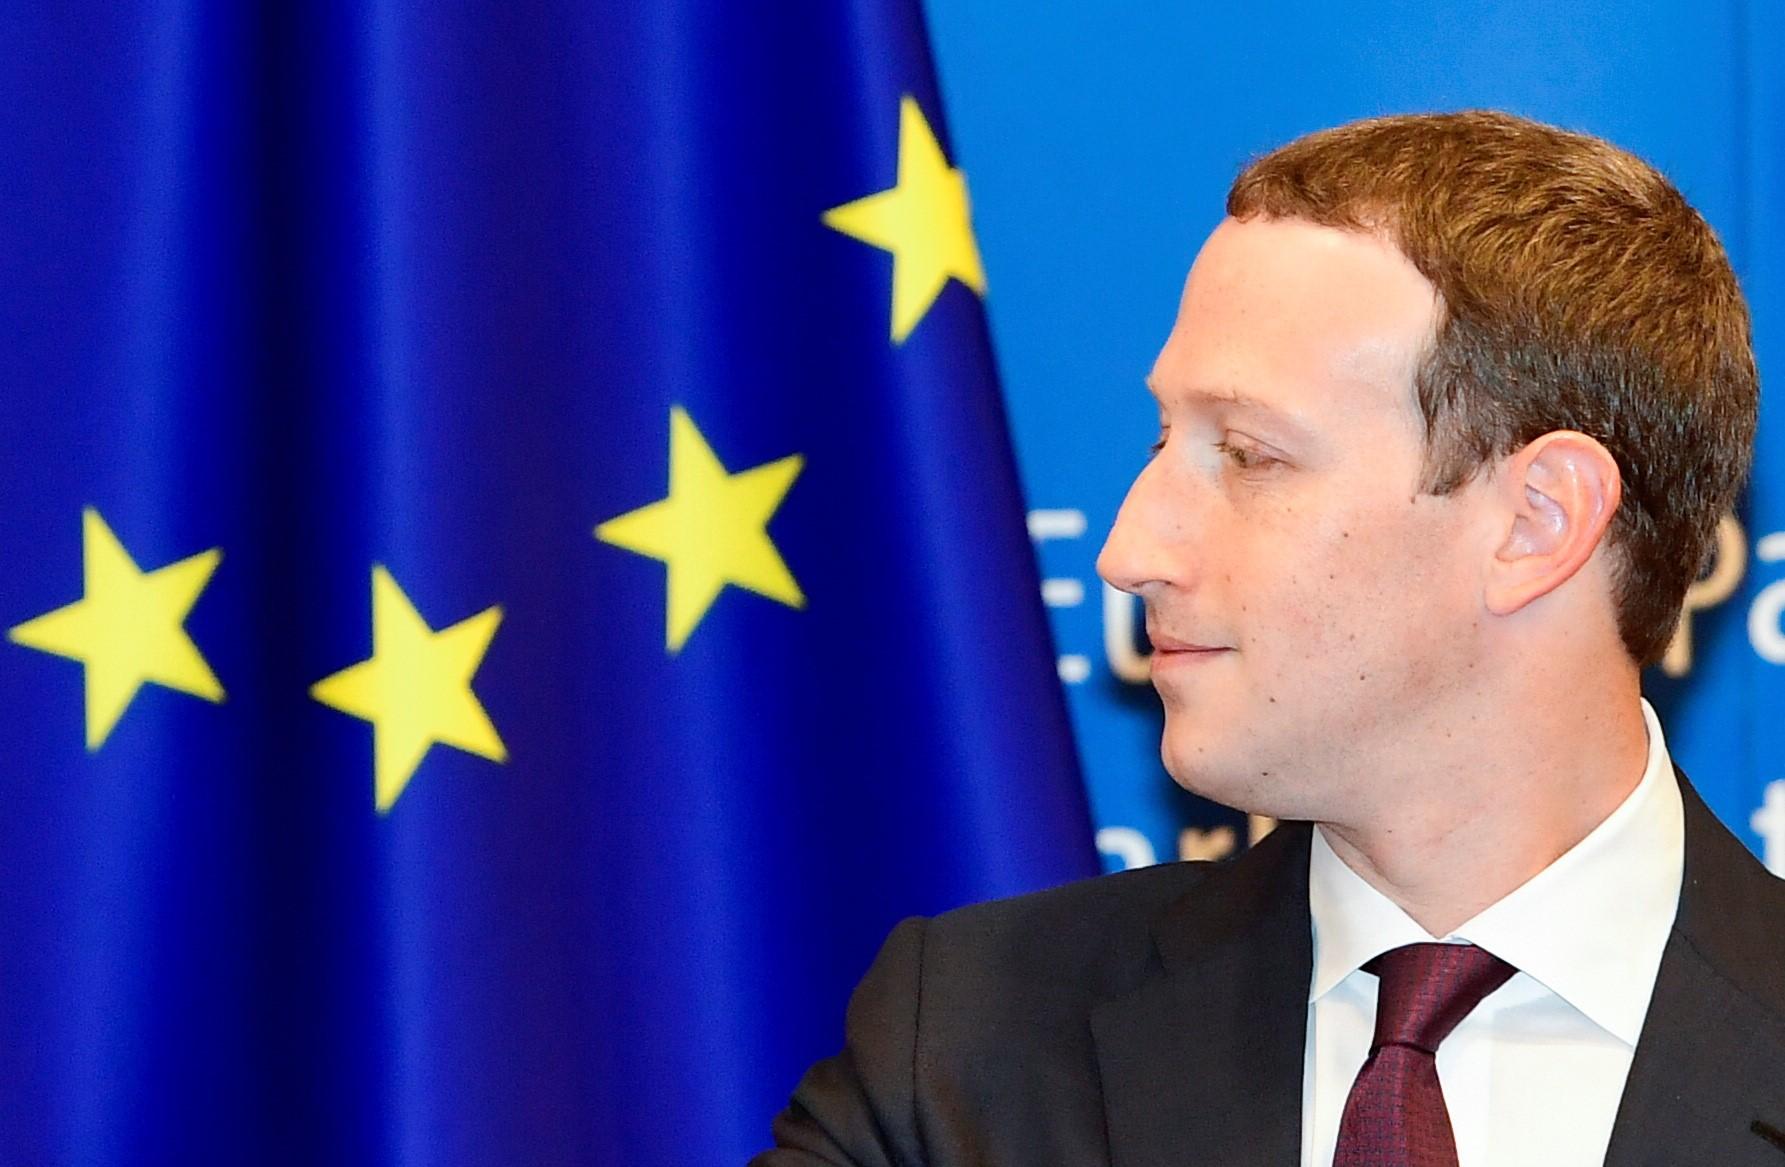 Mark Zuckerberg testifies at European Parliament